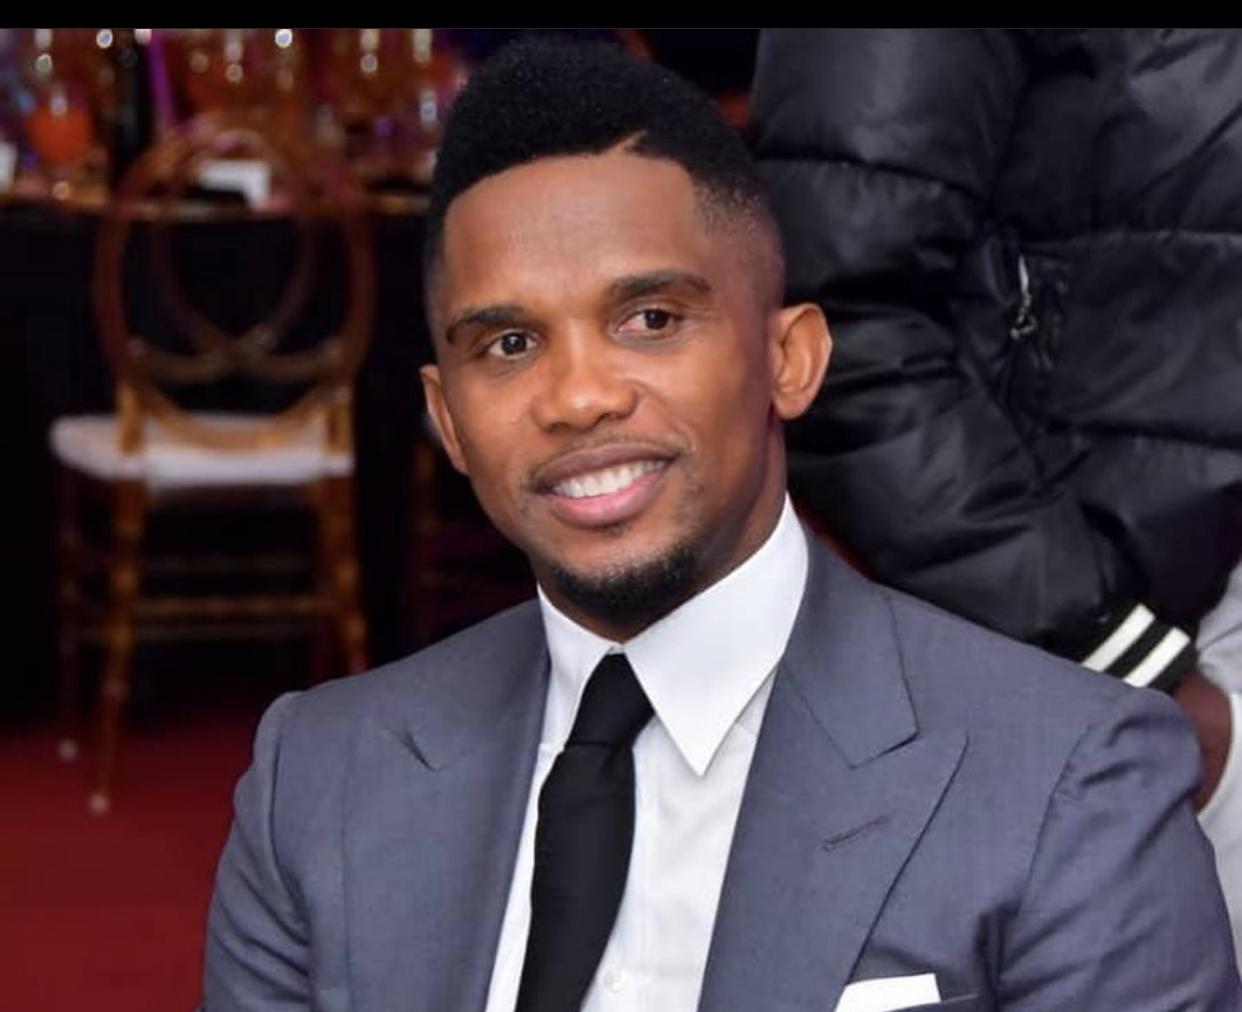 CAF Awards 2019 : Le quadruple ballon d'or Africain, Samuel Eto'o annoncera le vainqueur..